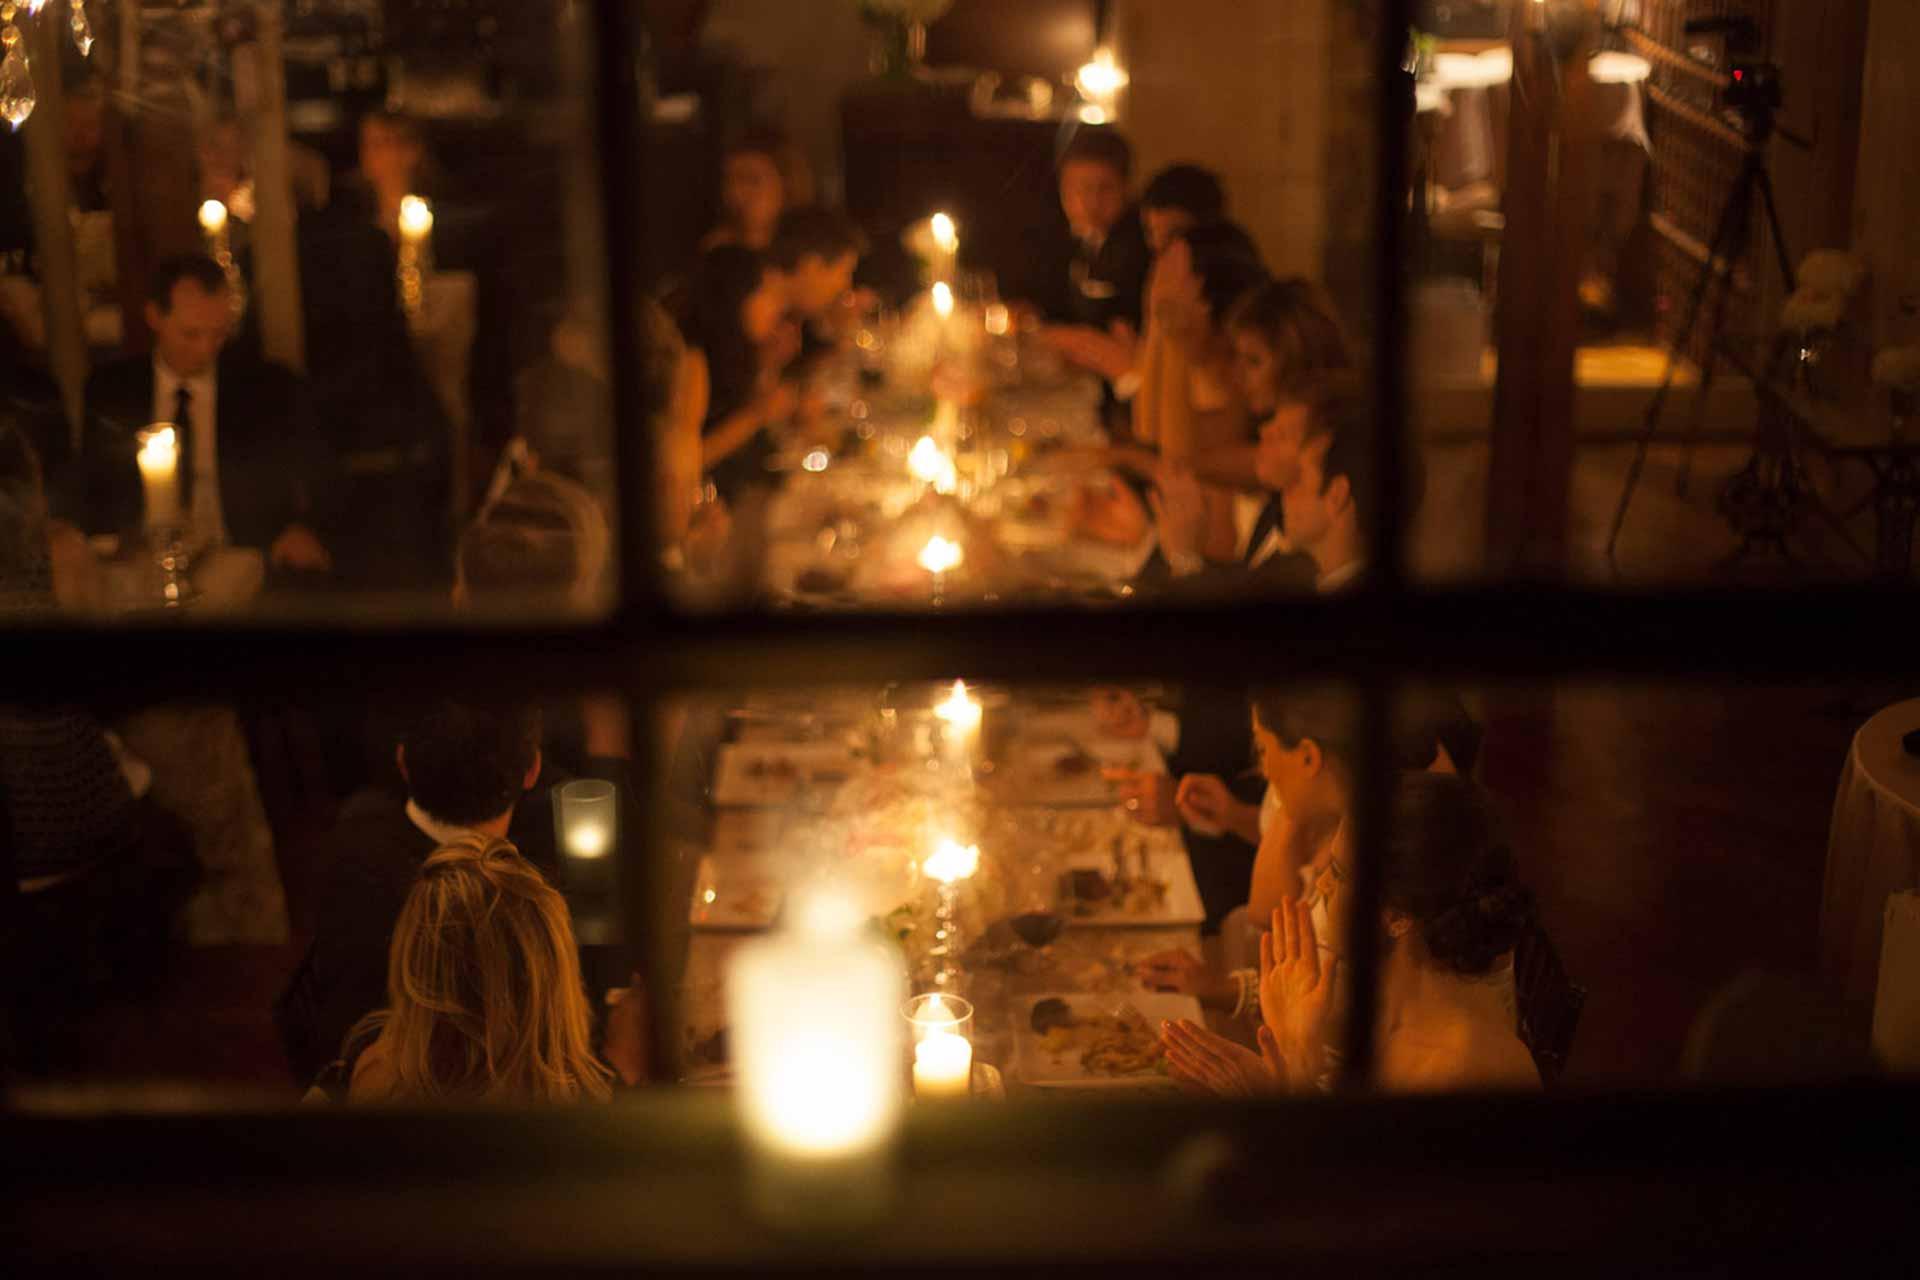 Toronto Wedding Venue - Intimate Restaurant Reception